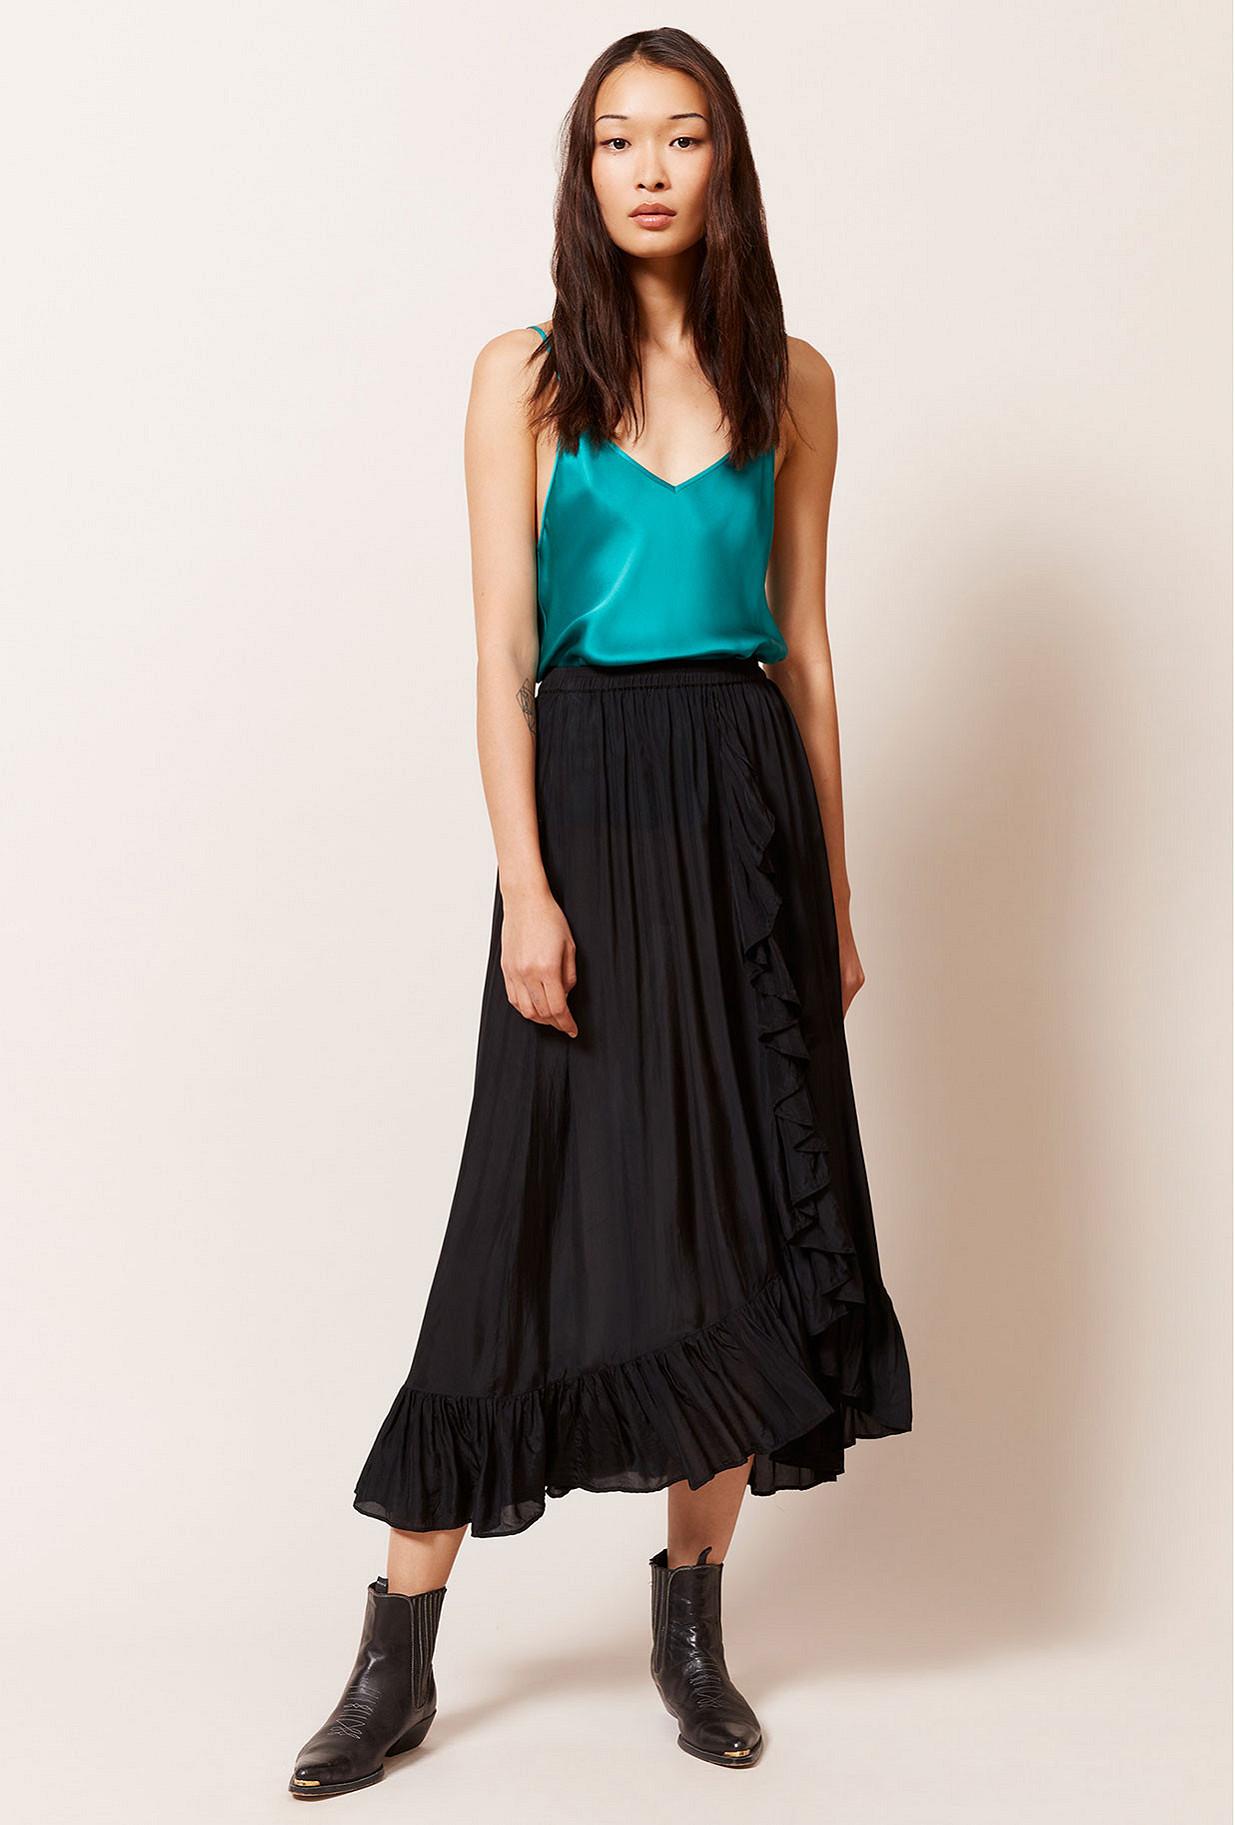 Paris clothes store Skirt  Habibi french designer fashion Paris